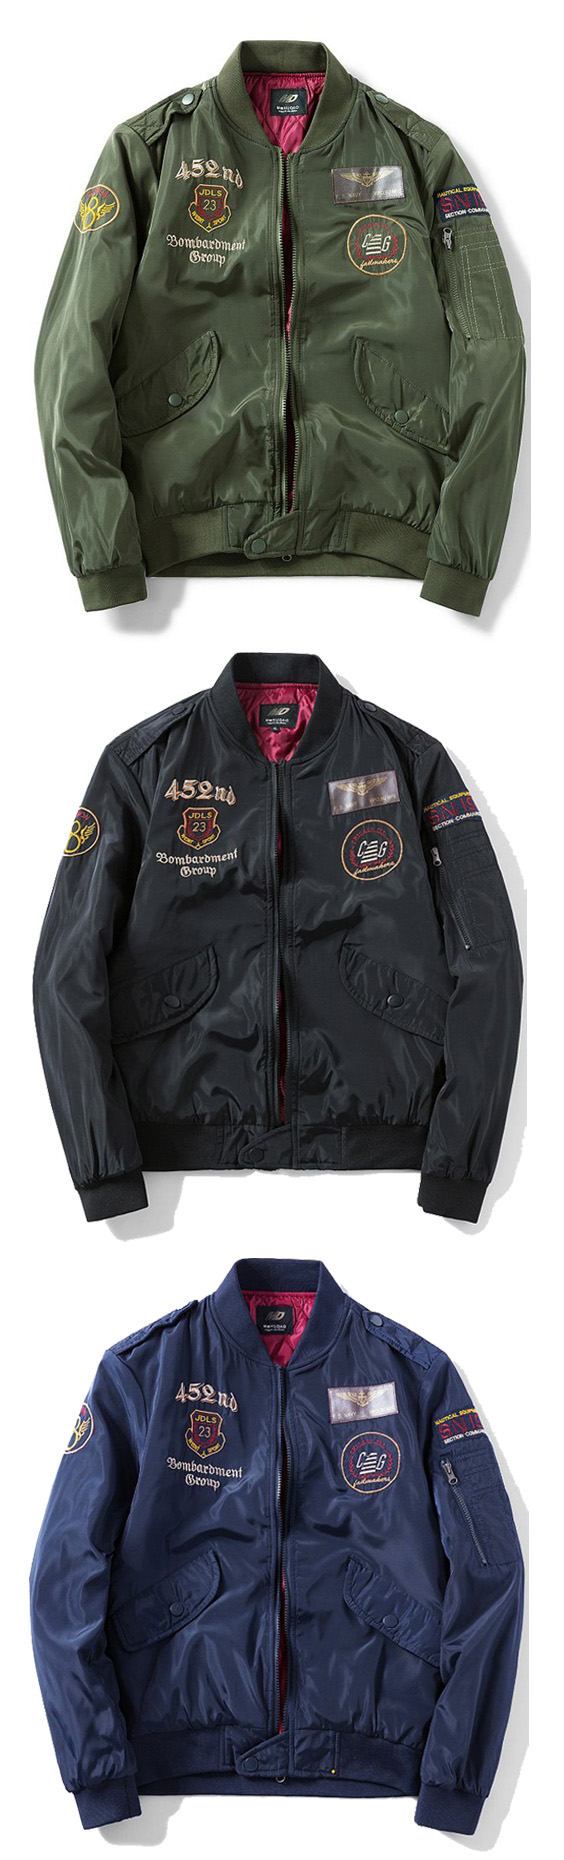 Zip Up Patch Design Epaulet Bomber Jacket Mens Outfits Bomber Jacket Jackets [ 1860 x 564 Pixel ]